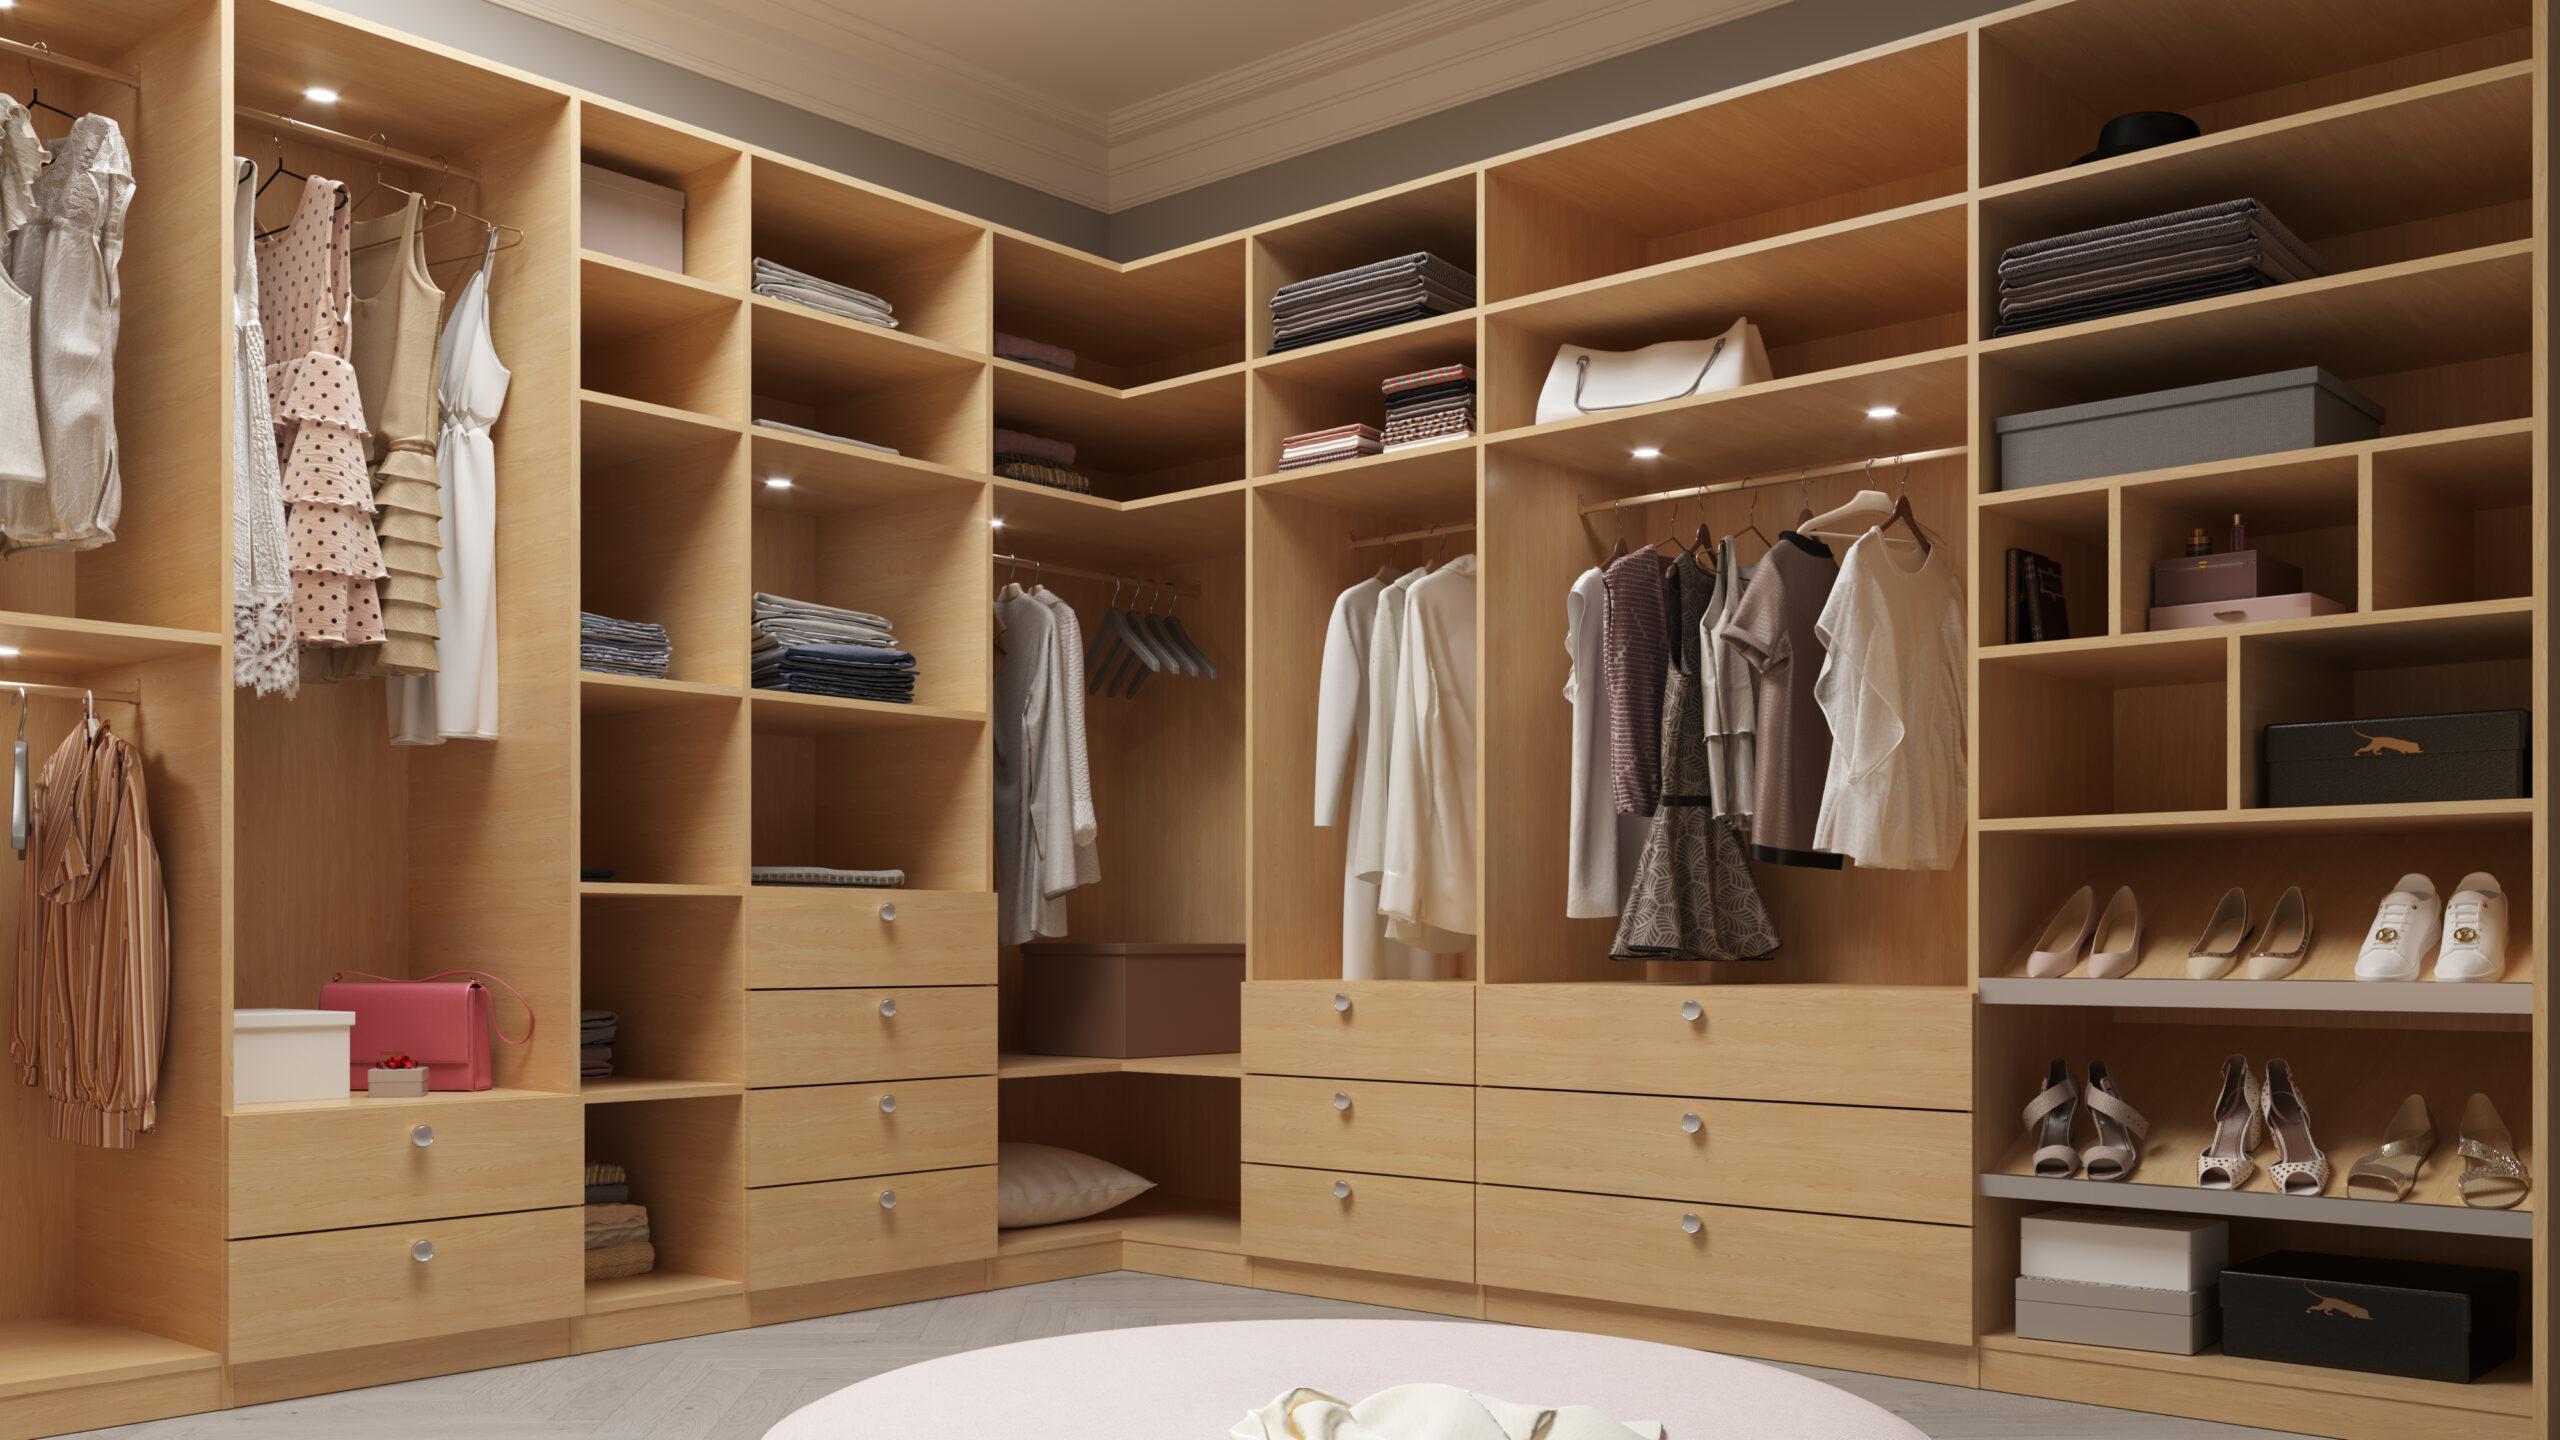 19mm_wardrobe_1_tz6_2